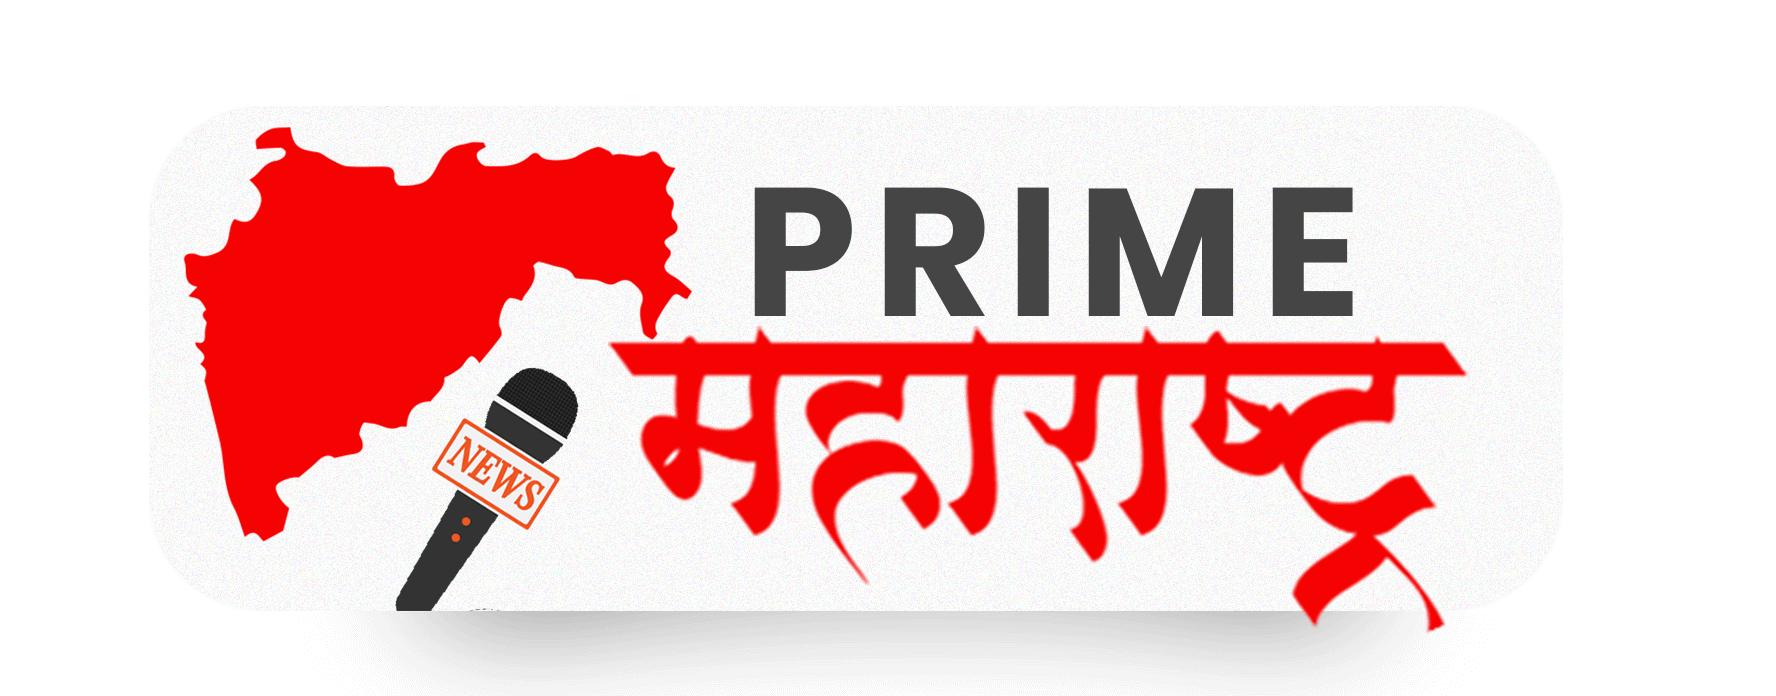 Prime Maharashtra